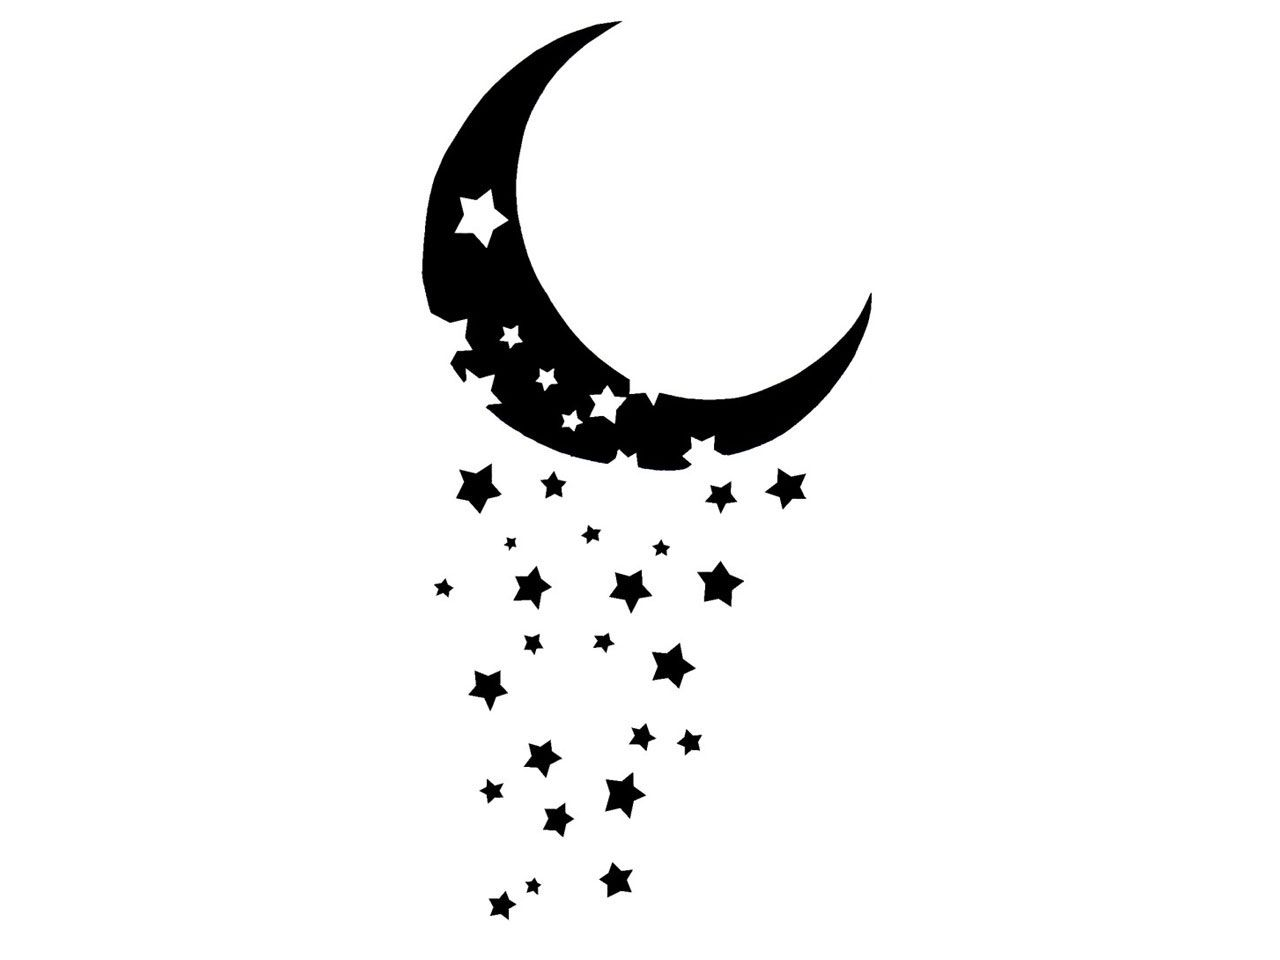 Moon And Stars Tattoos Designs